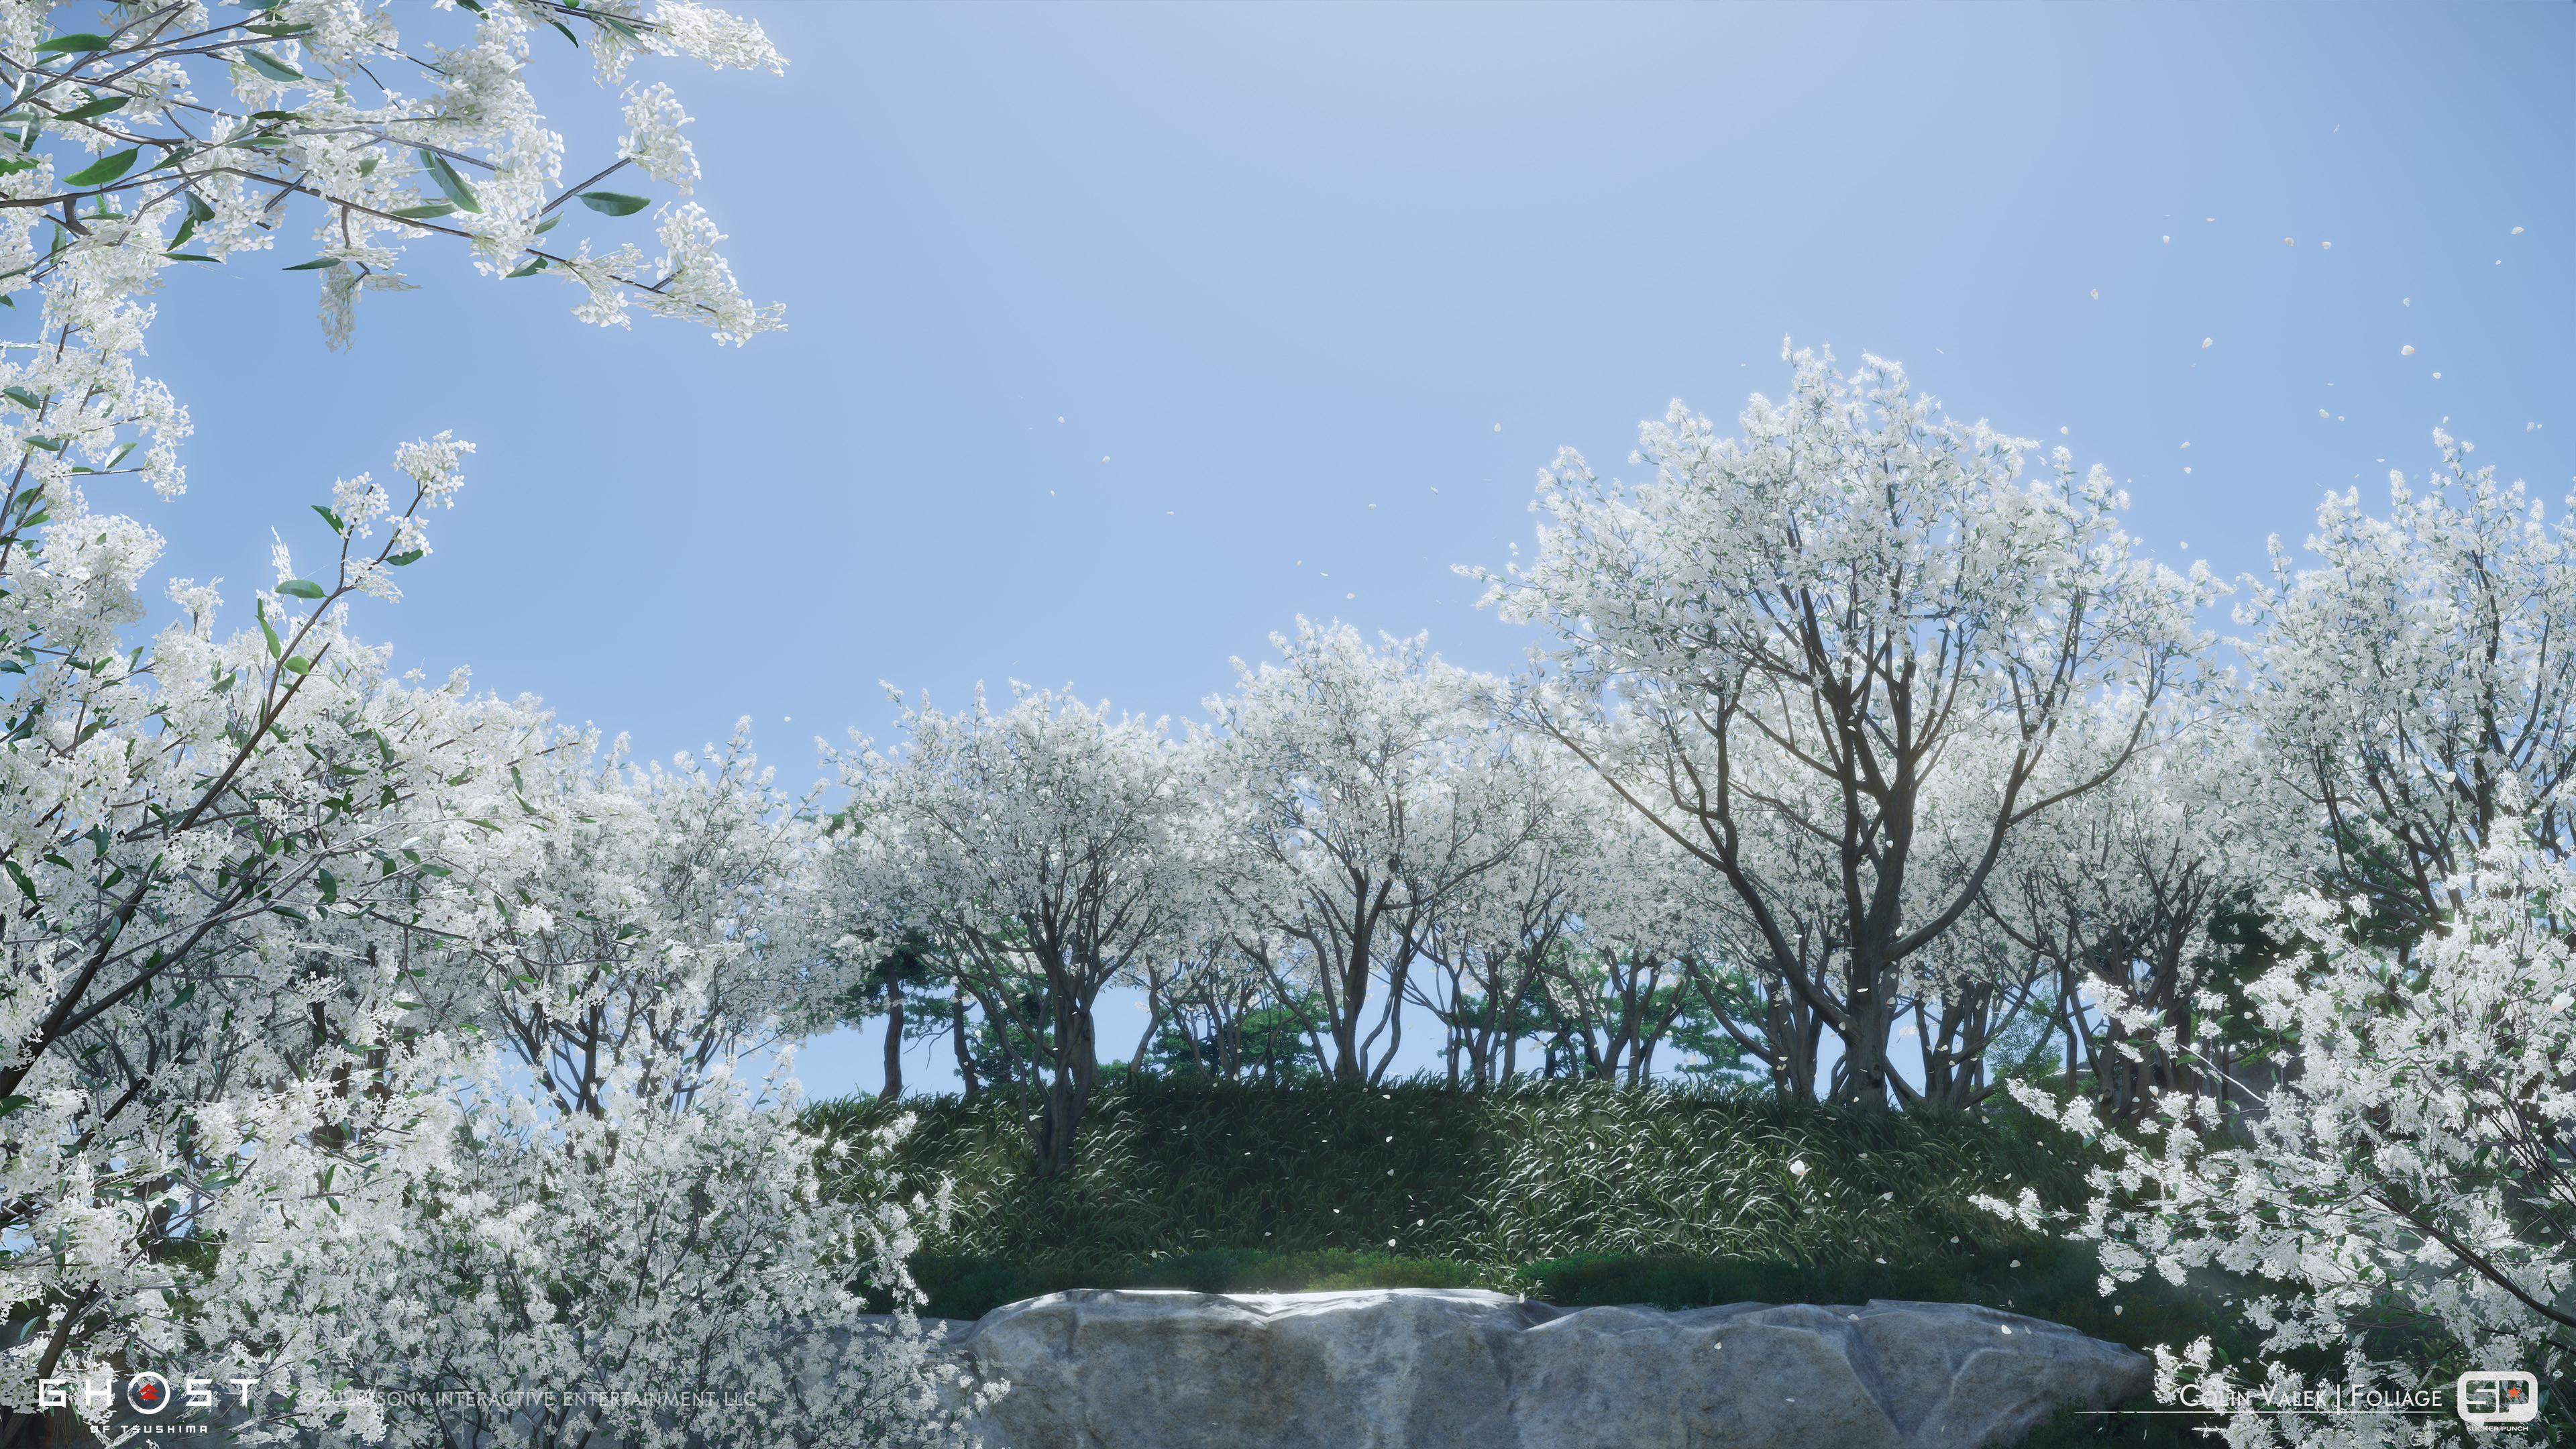 Osmanthus trees